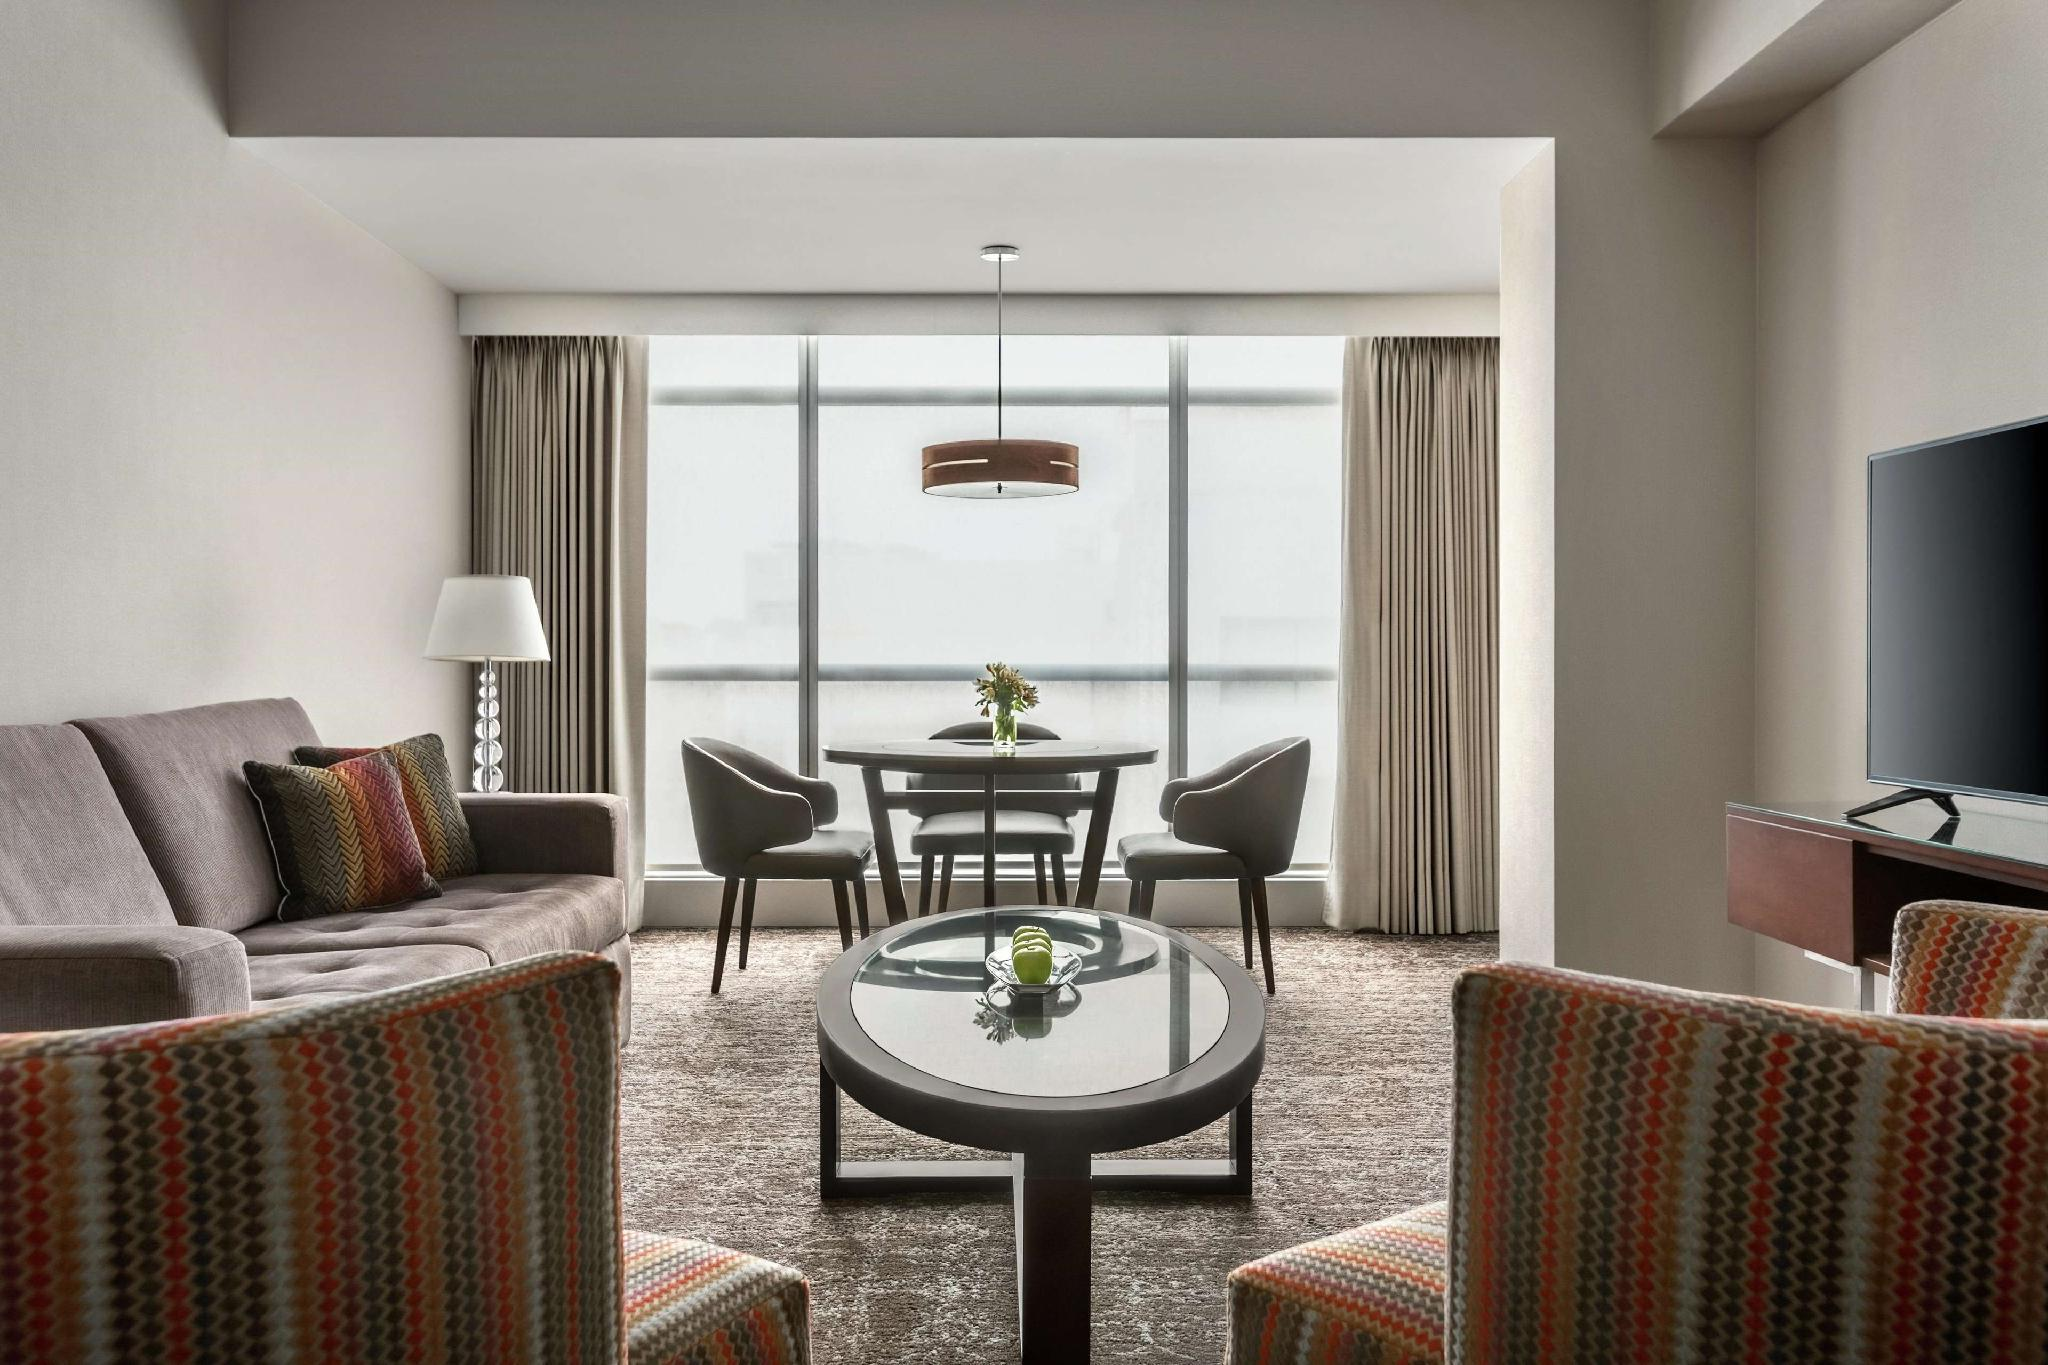 Picture of: El Pardo Doubletree By Hilton Hotel Lima Booking Deals Photos Reviews